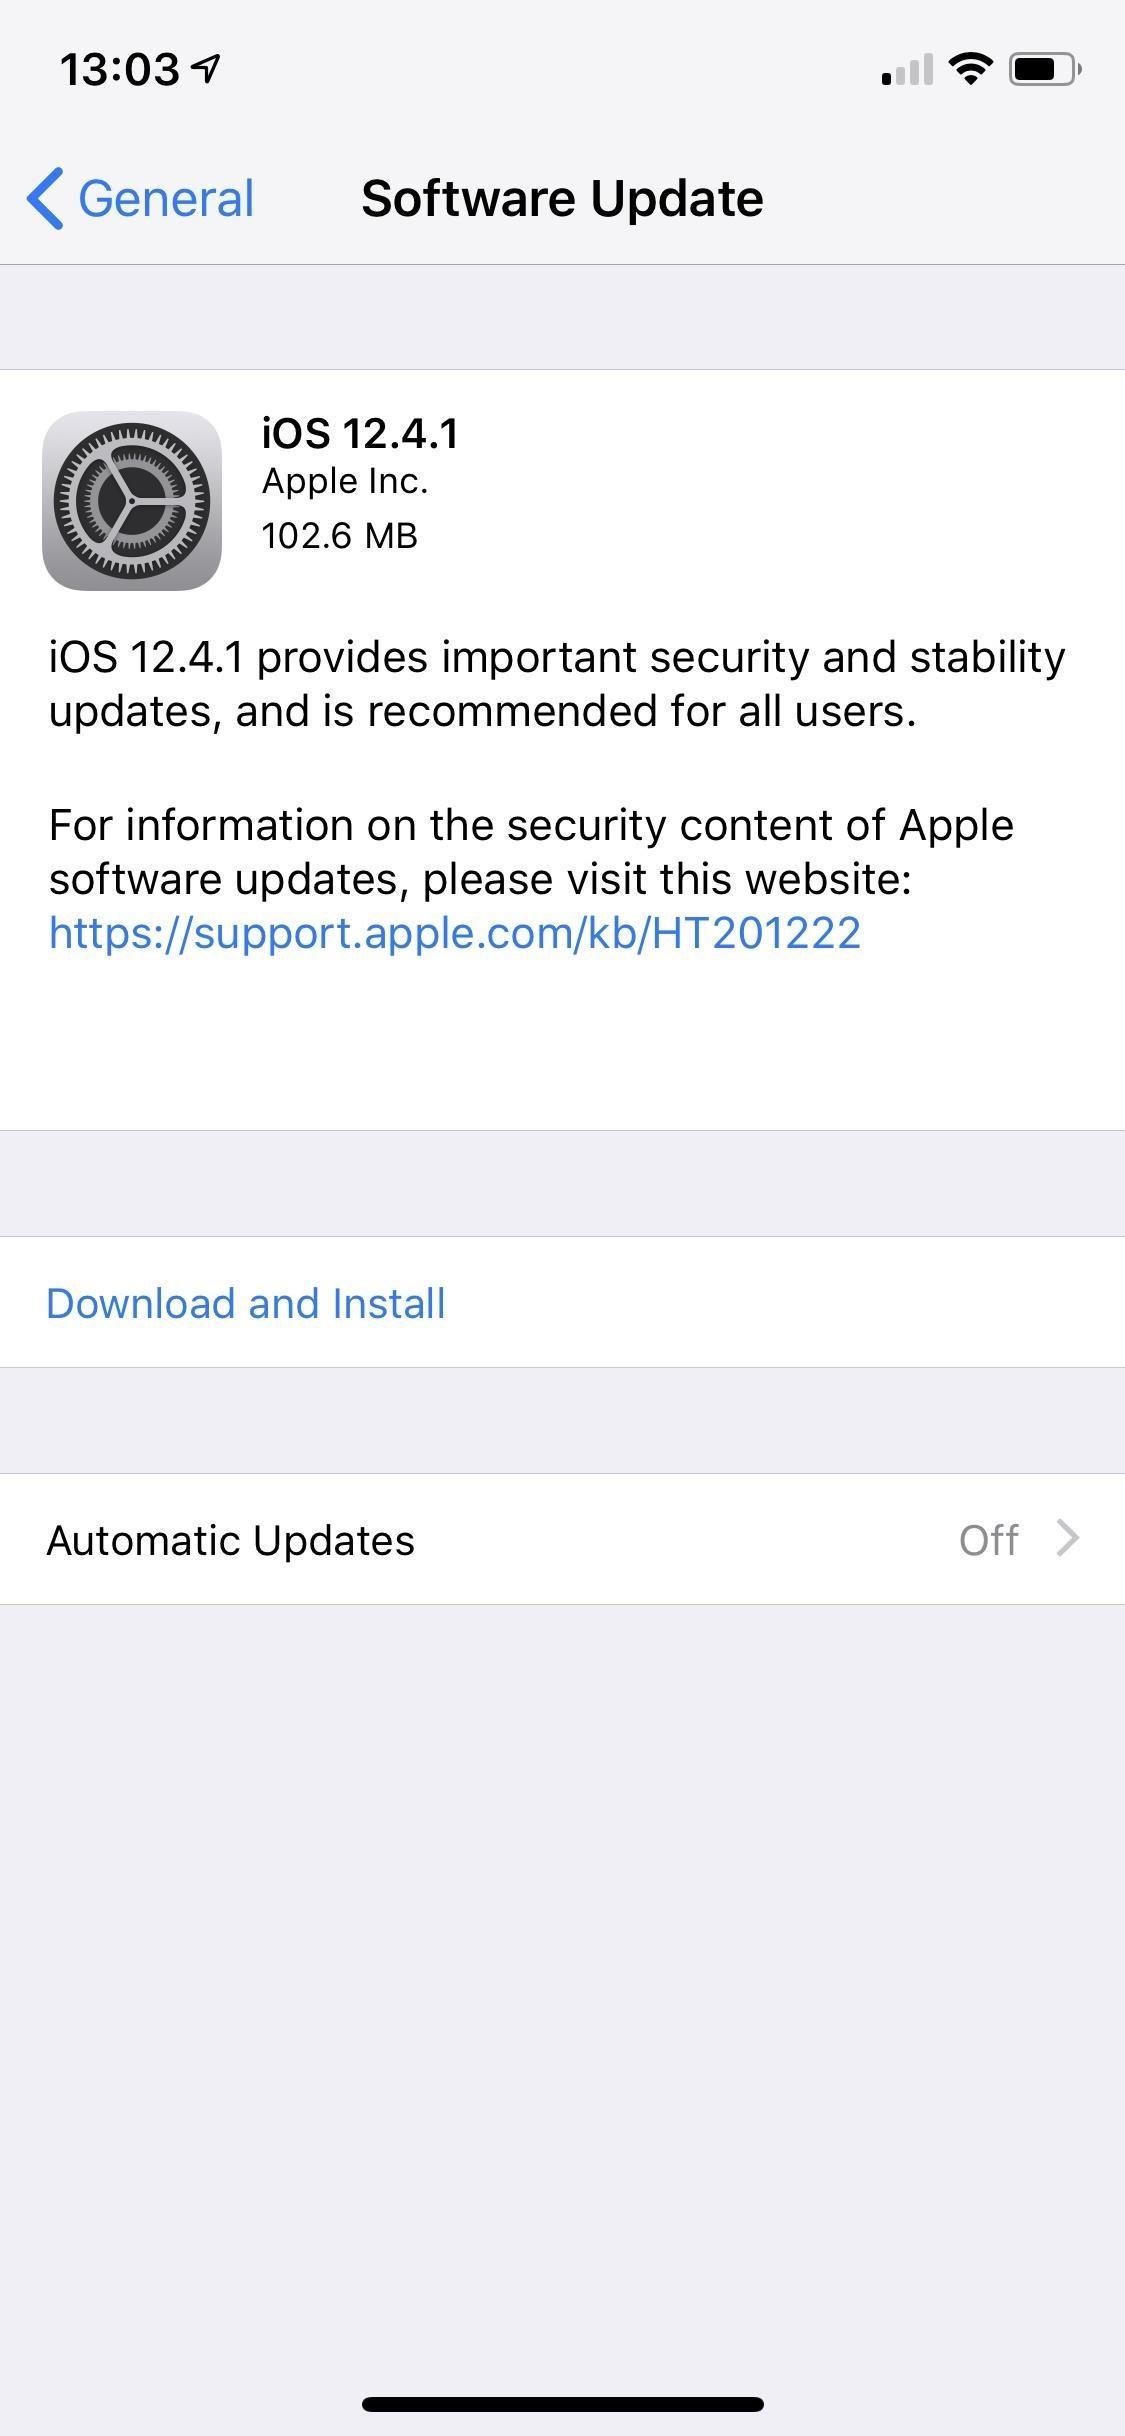 Apple addresses the vulnerability